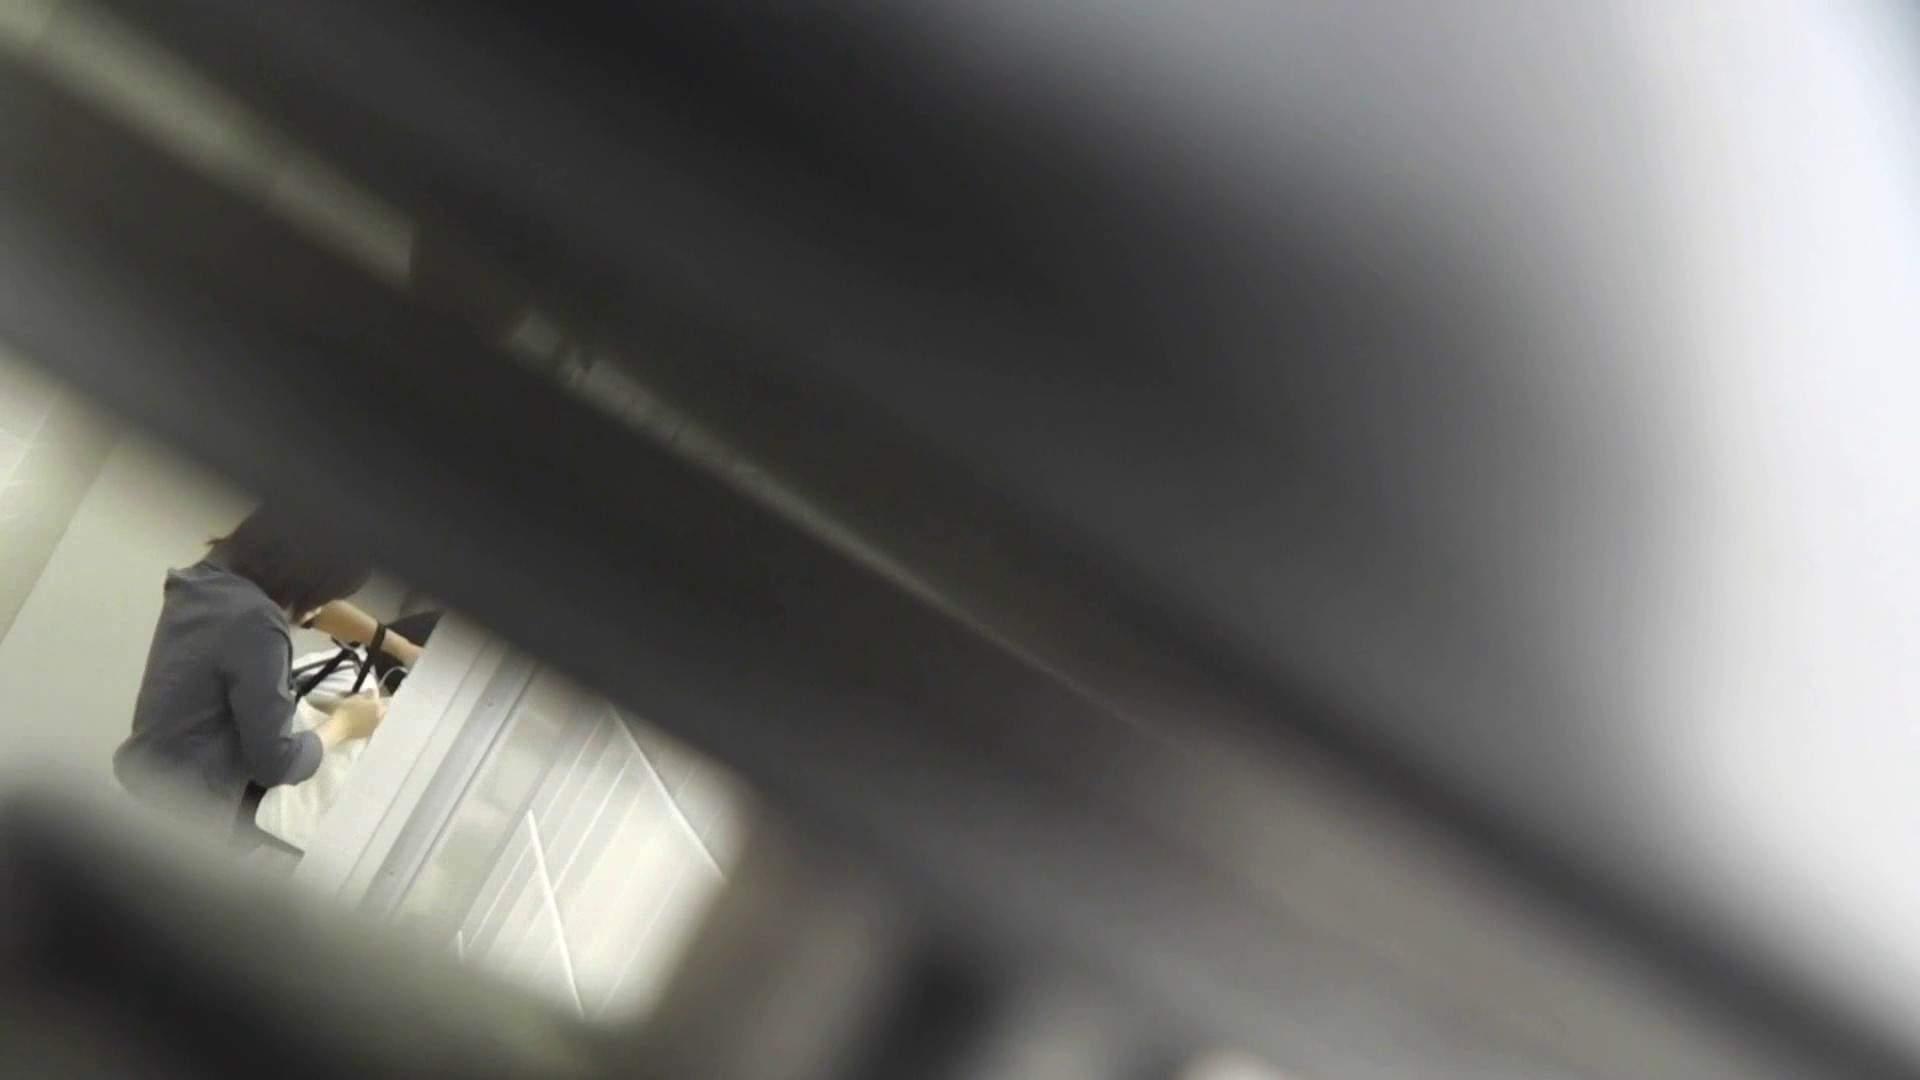 vol.25三十時間潜り、一つしか出会えない完璧桃尻編 byお銀 美人   洗面所  96pic 73